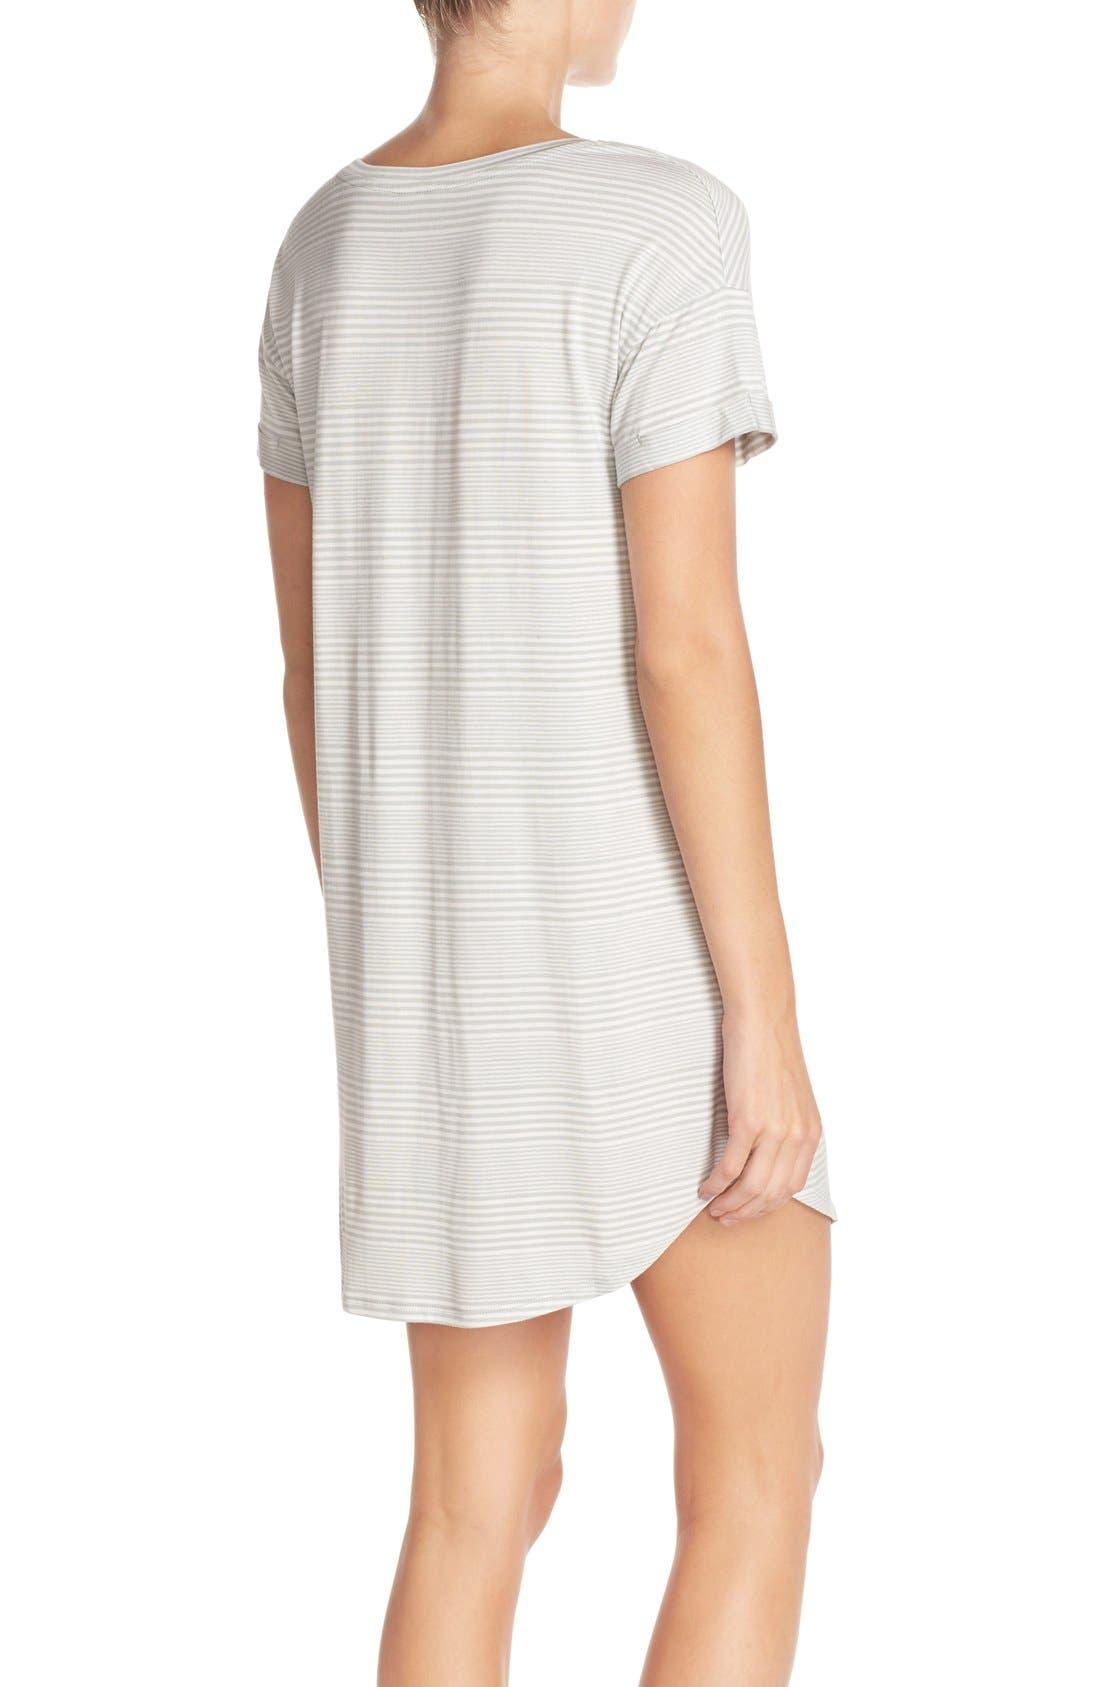 Alternate Image 2  - Nordstrom Lingerie Graphic Jersey Sleep Shirt